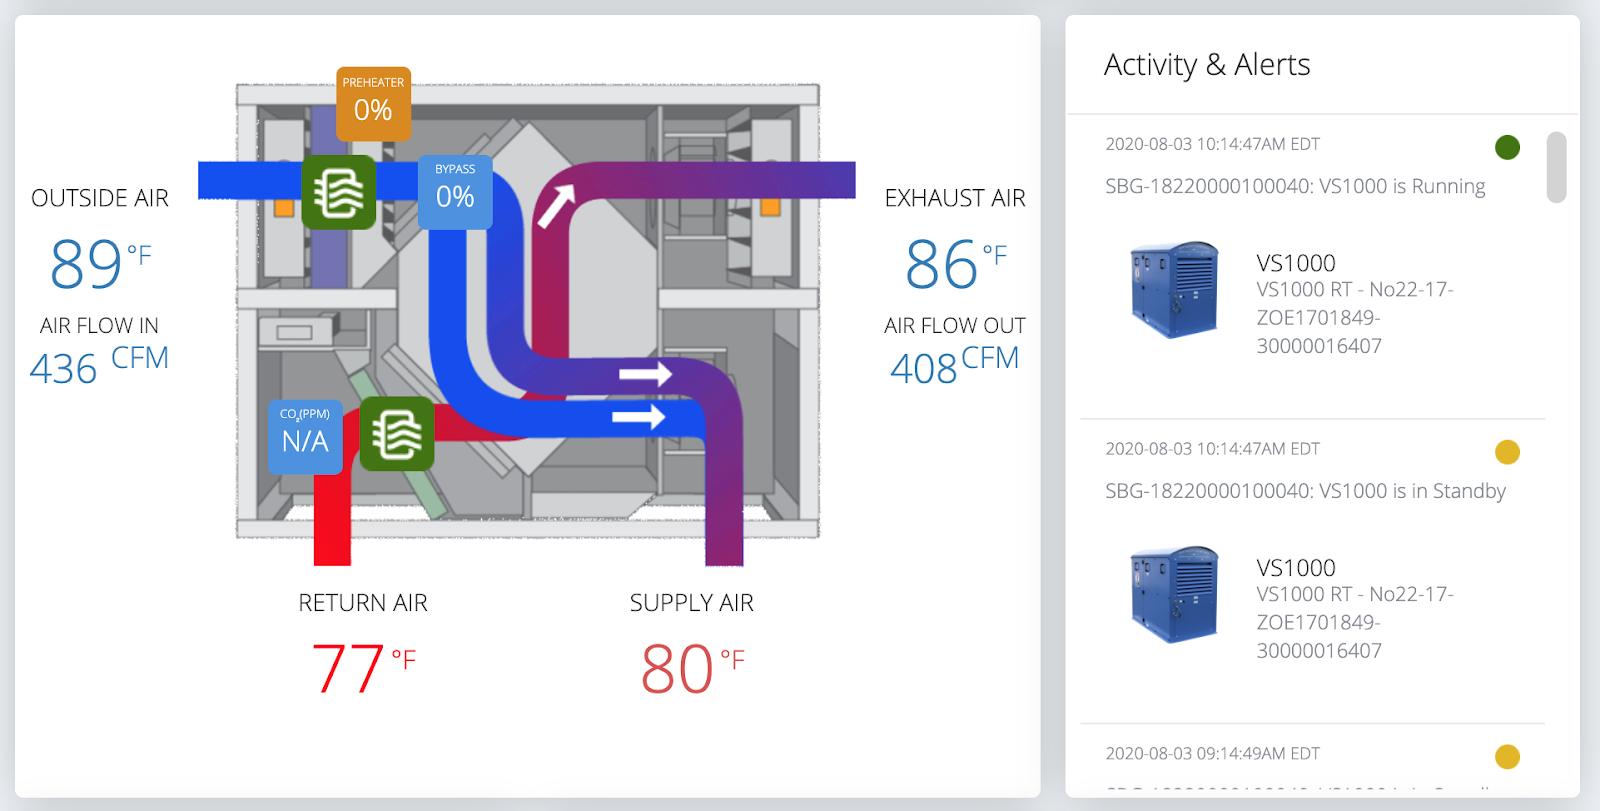 Ventacity Fresh Air Ventilation (HRV) System Dashboard